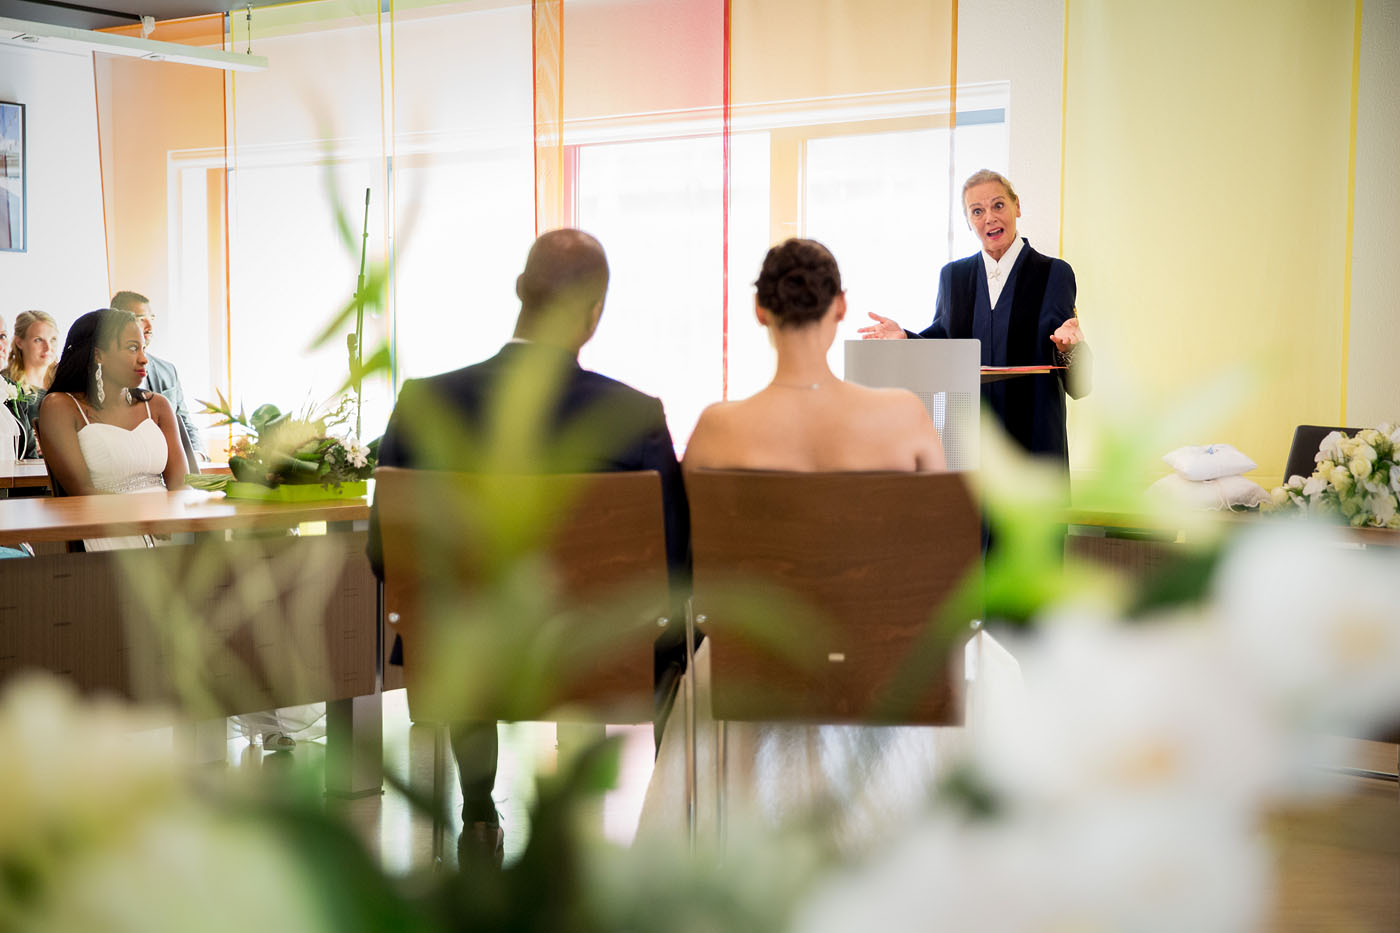 bruiloft-wedding-trouwen-rotterdam-fotograaf-bobhersbach-bijna